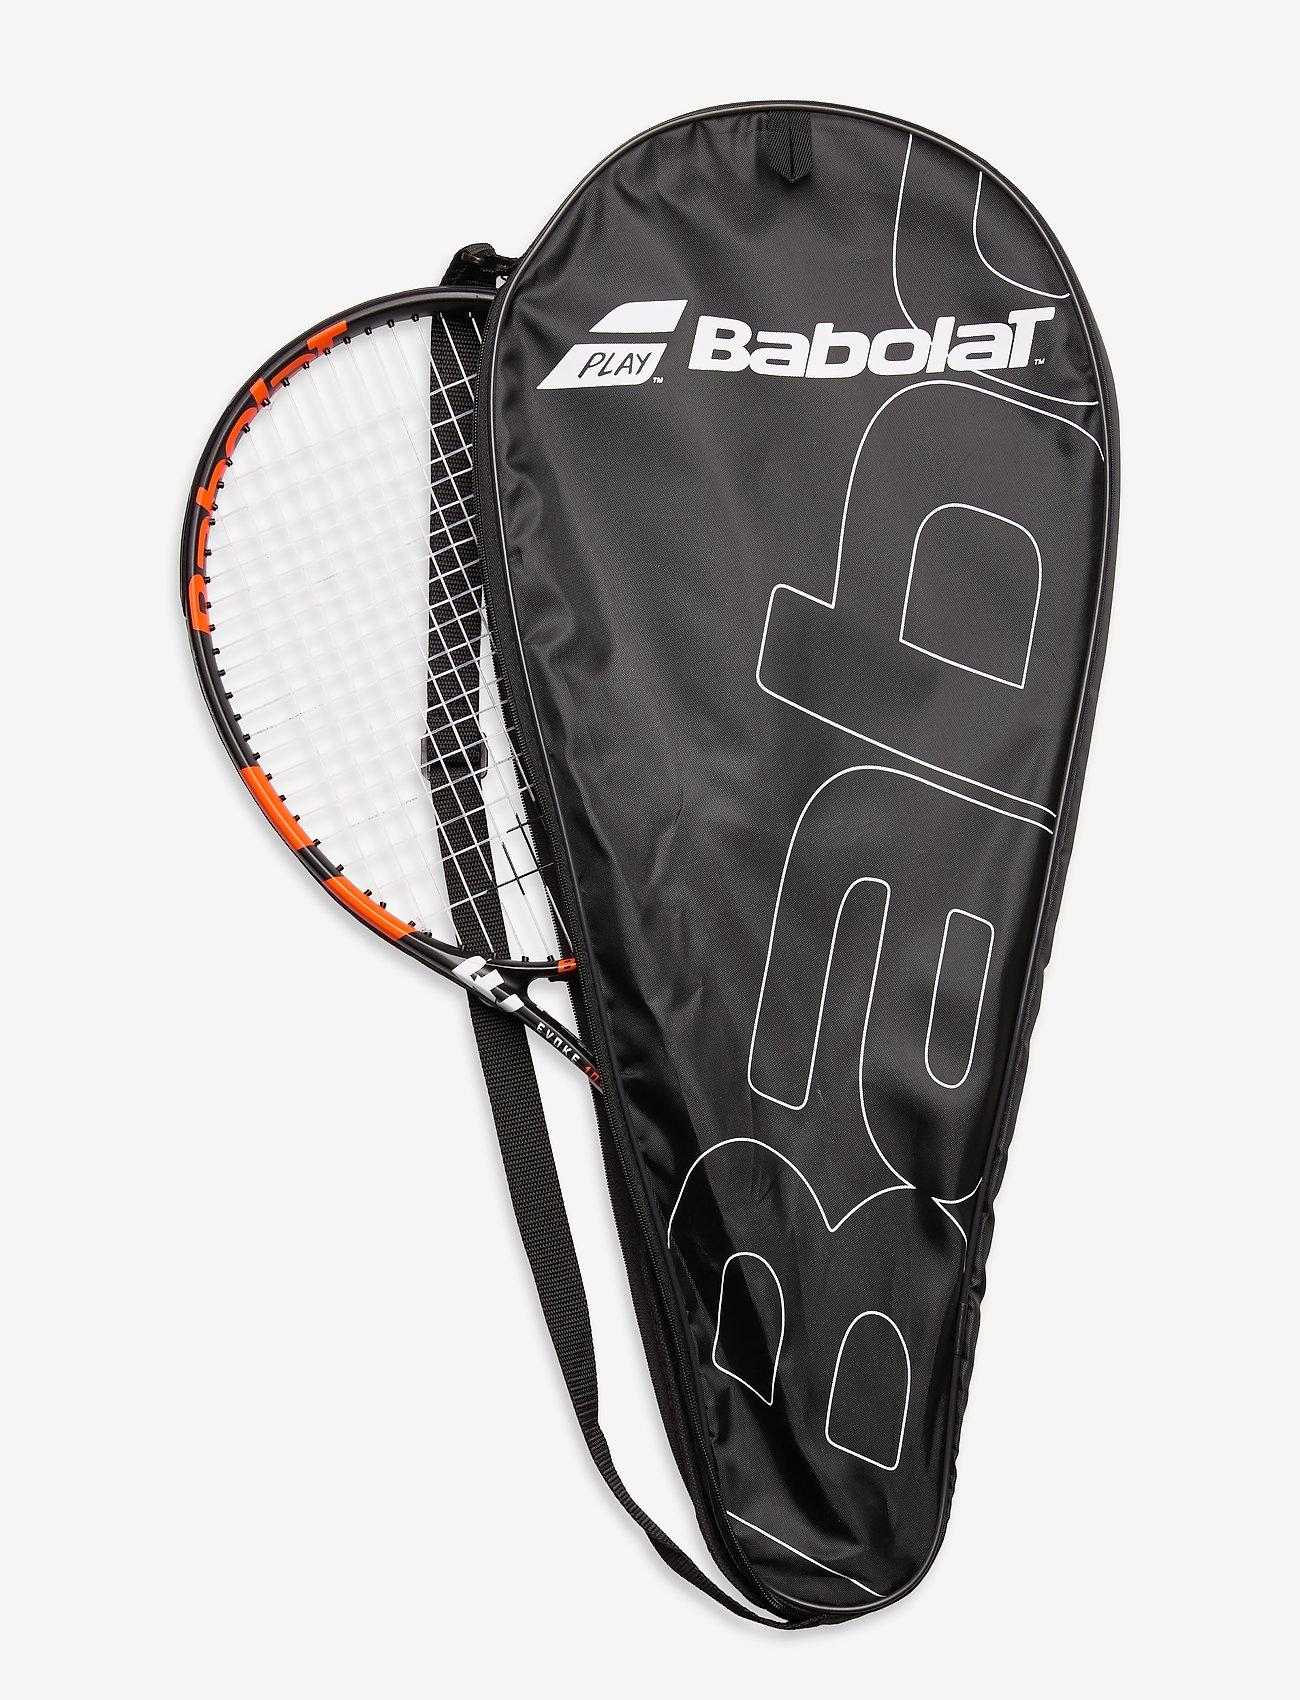 Babolat - EVOKE 105 STRUNG - tennis ketcher - 162 black orange - 1